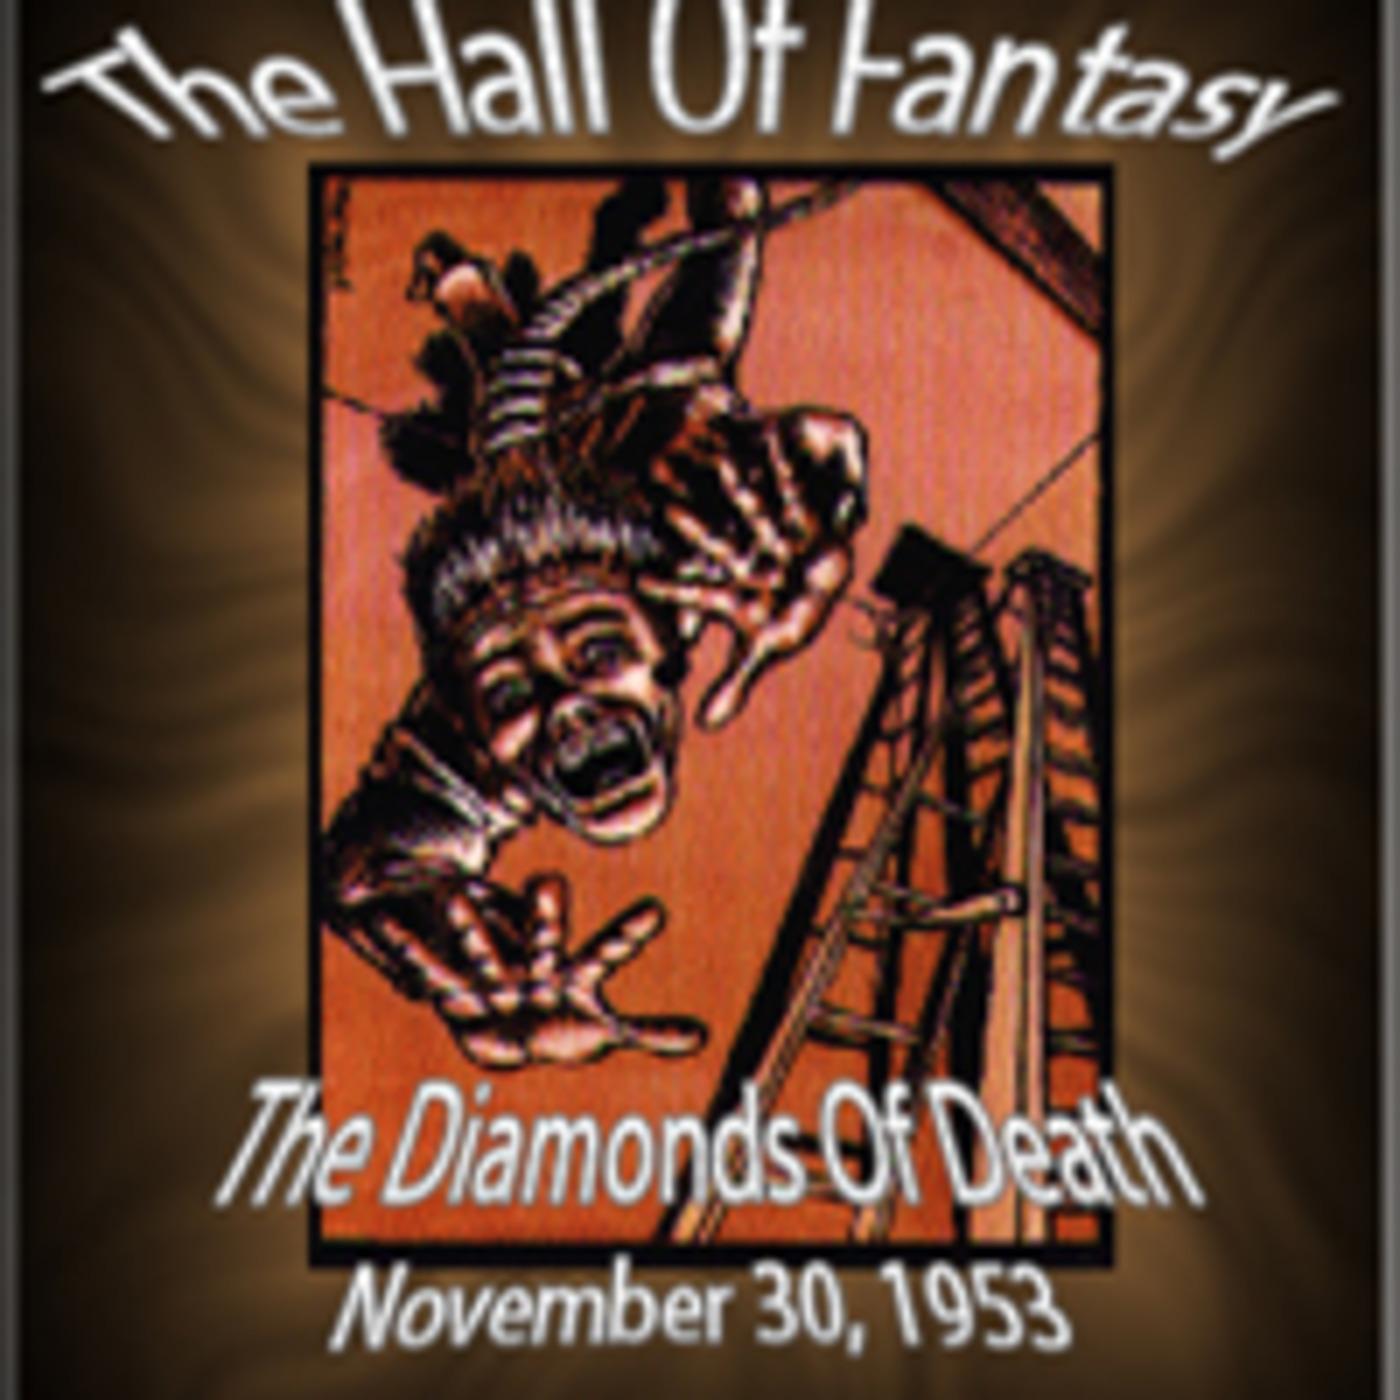 The Hall Of Fantasy - Diamonds Of Death (11-30-53)